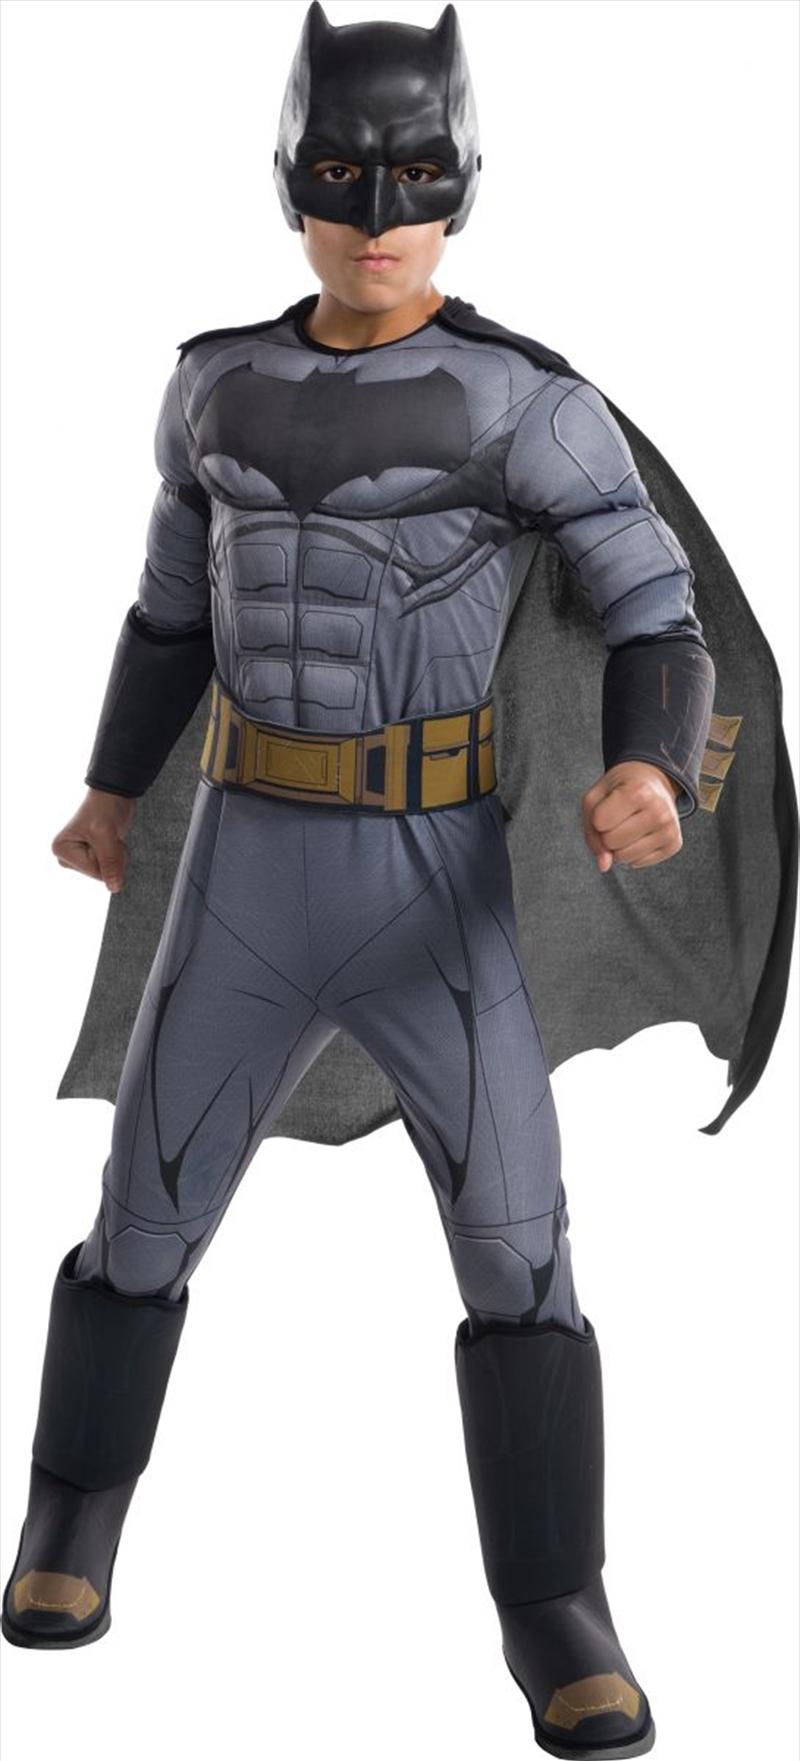 Kids Deluxe Batman Justice League Costume (Small) | Apparel